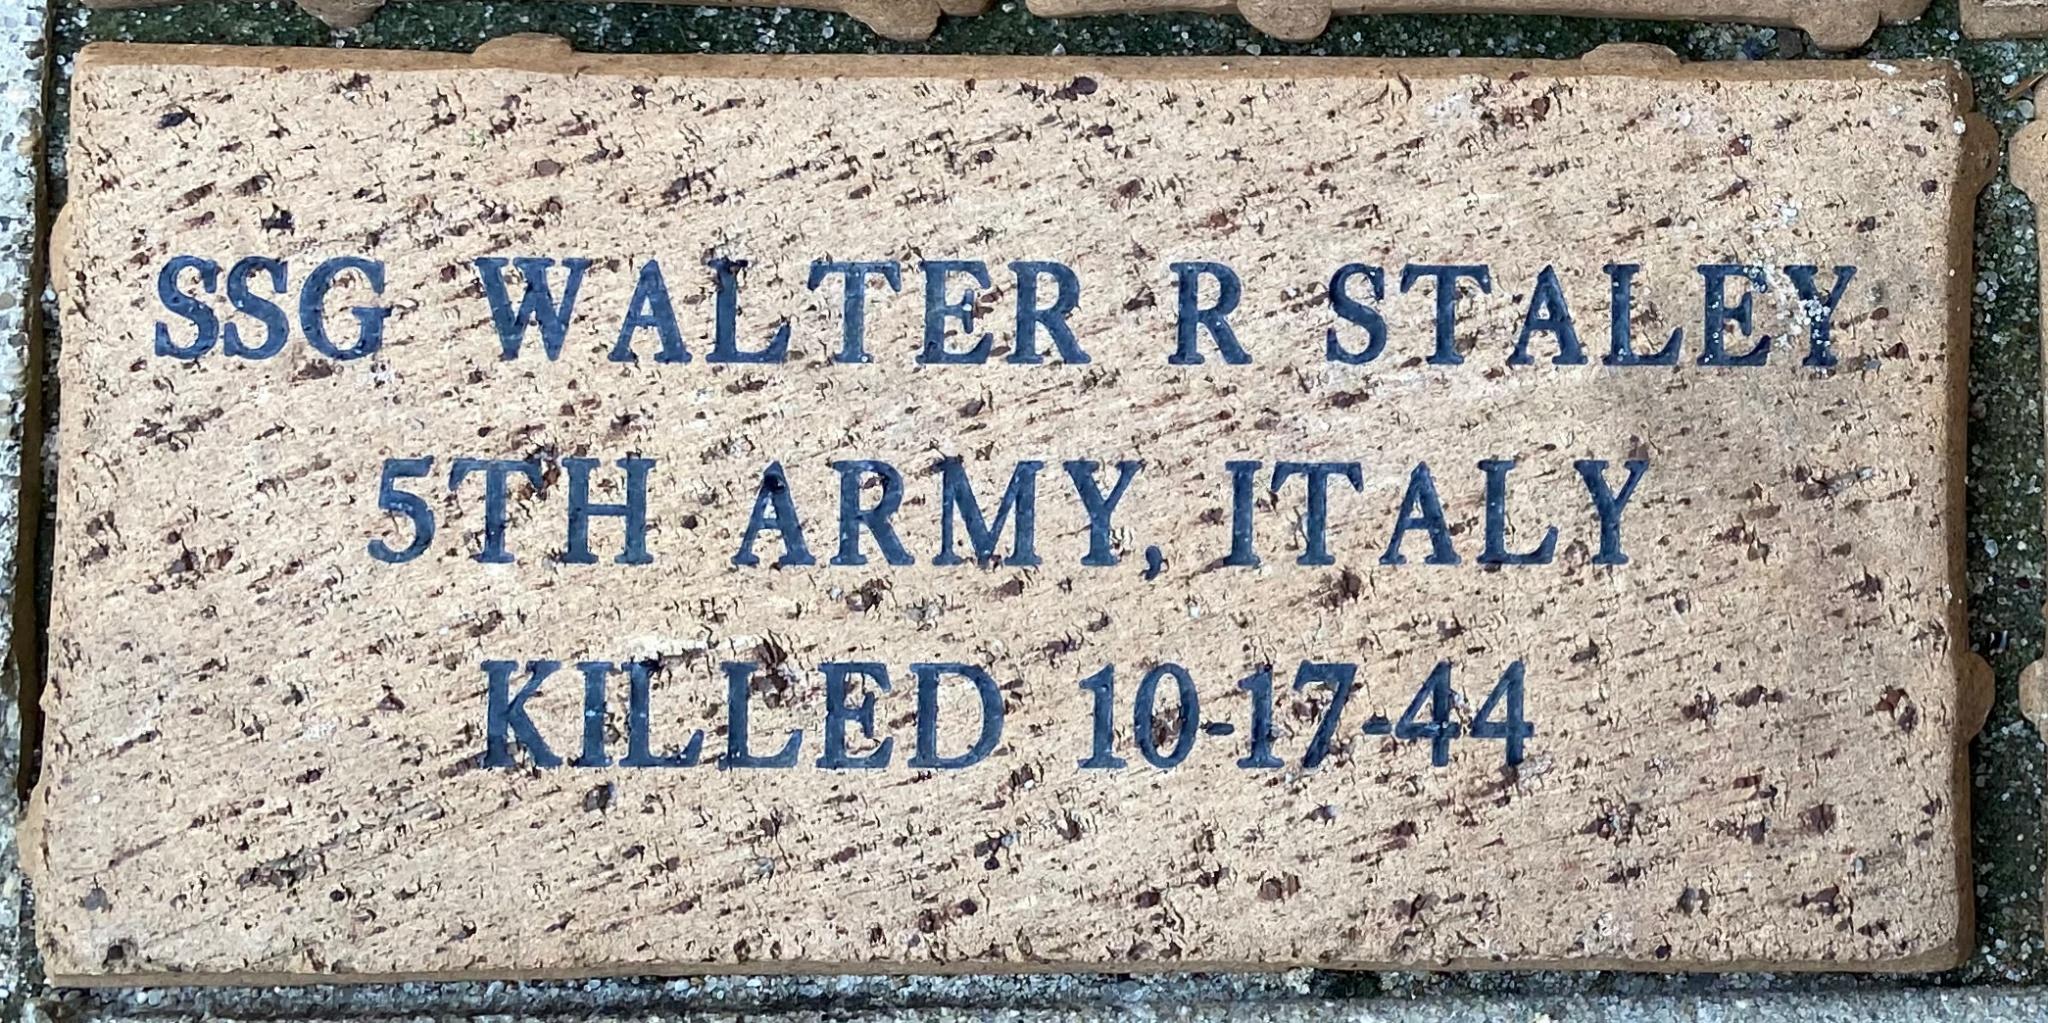 SSG WALTER R STALEY 5TH ARMY, ITALY KILLED 10-17-44